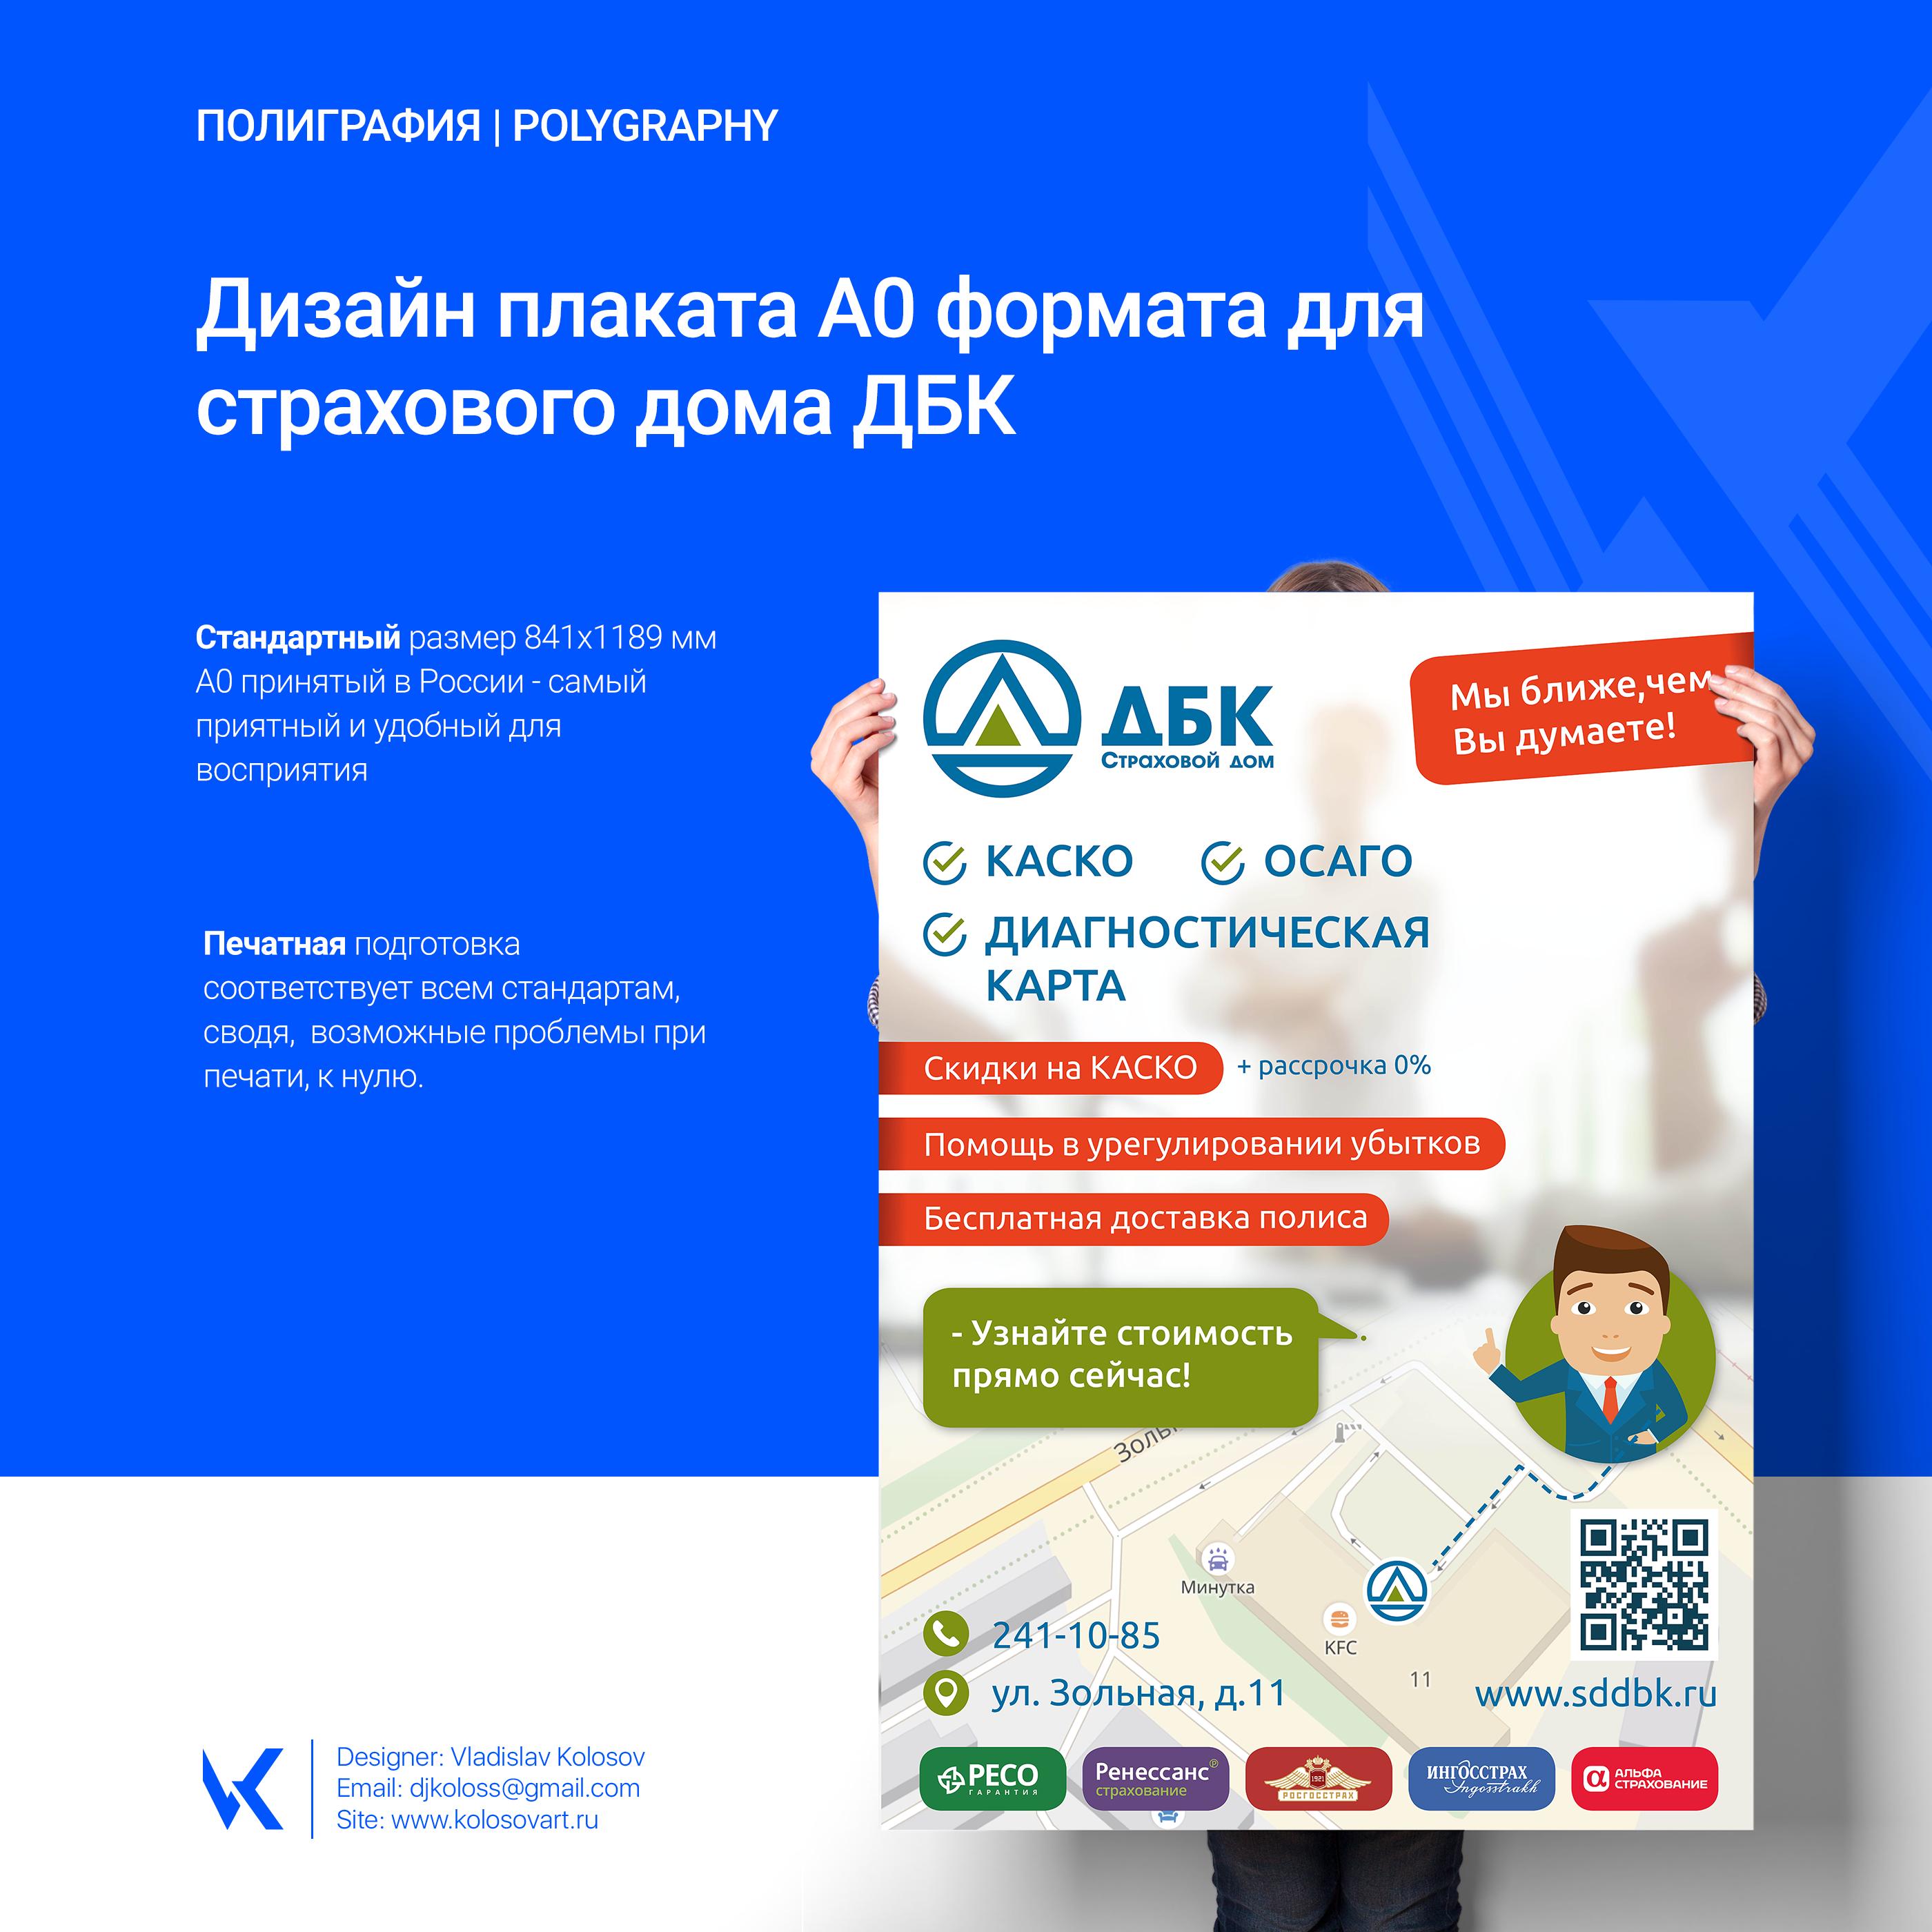 Дизайн плаката А0 формата для страхового дома ДБК